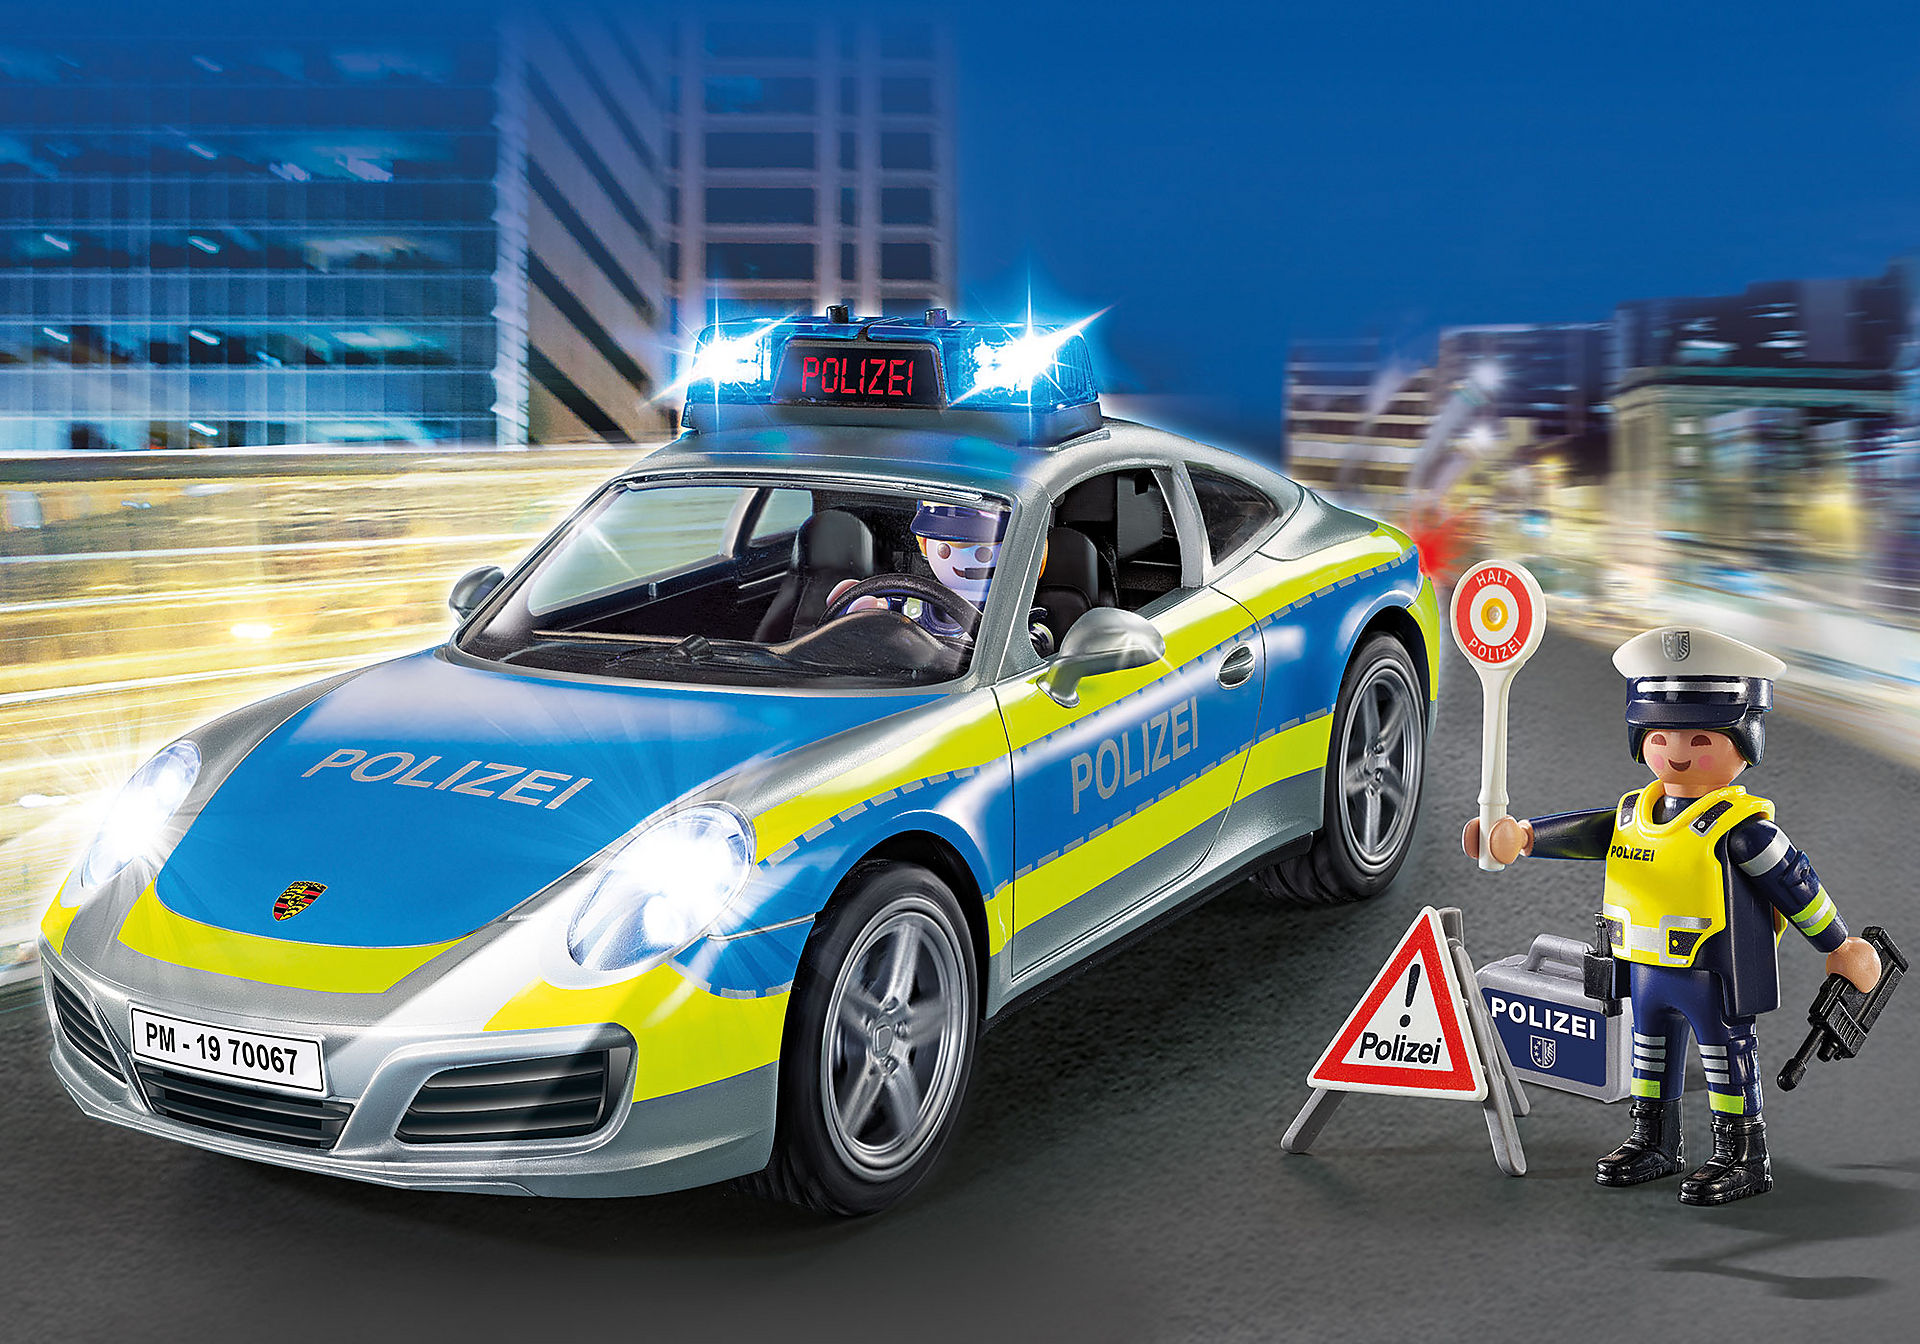 70067 Porsche 911 Carrera 4S Polis – Grå zoom image1